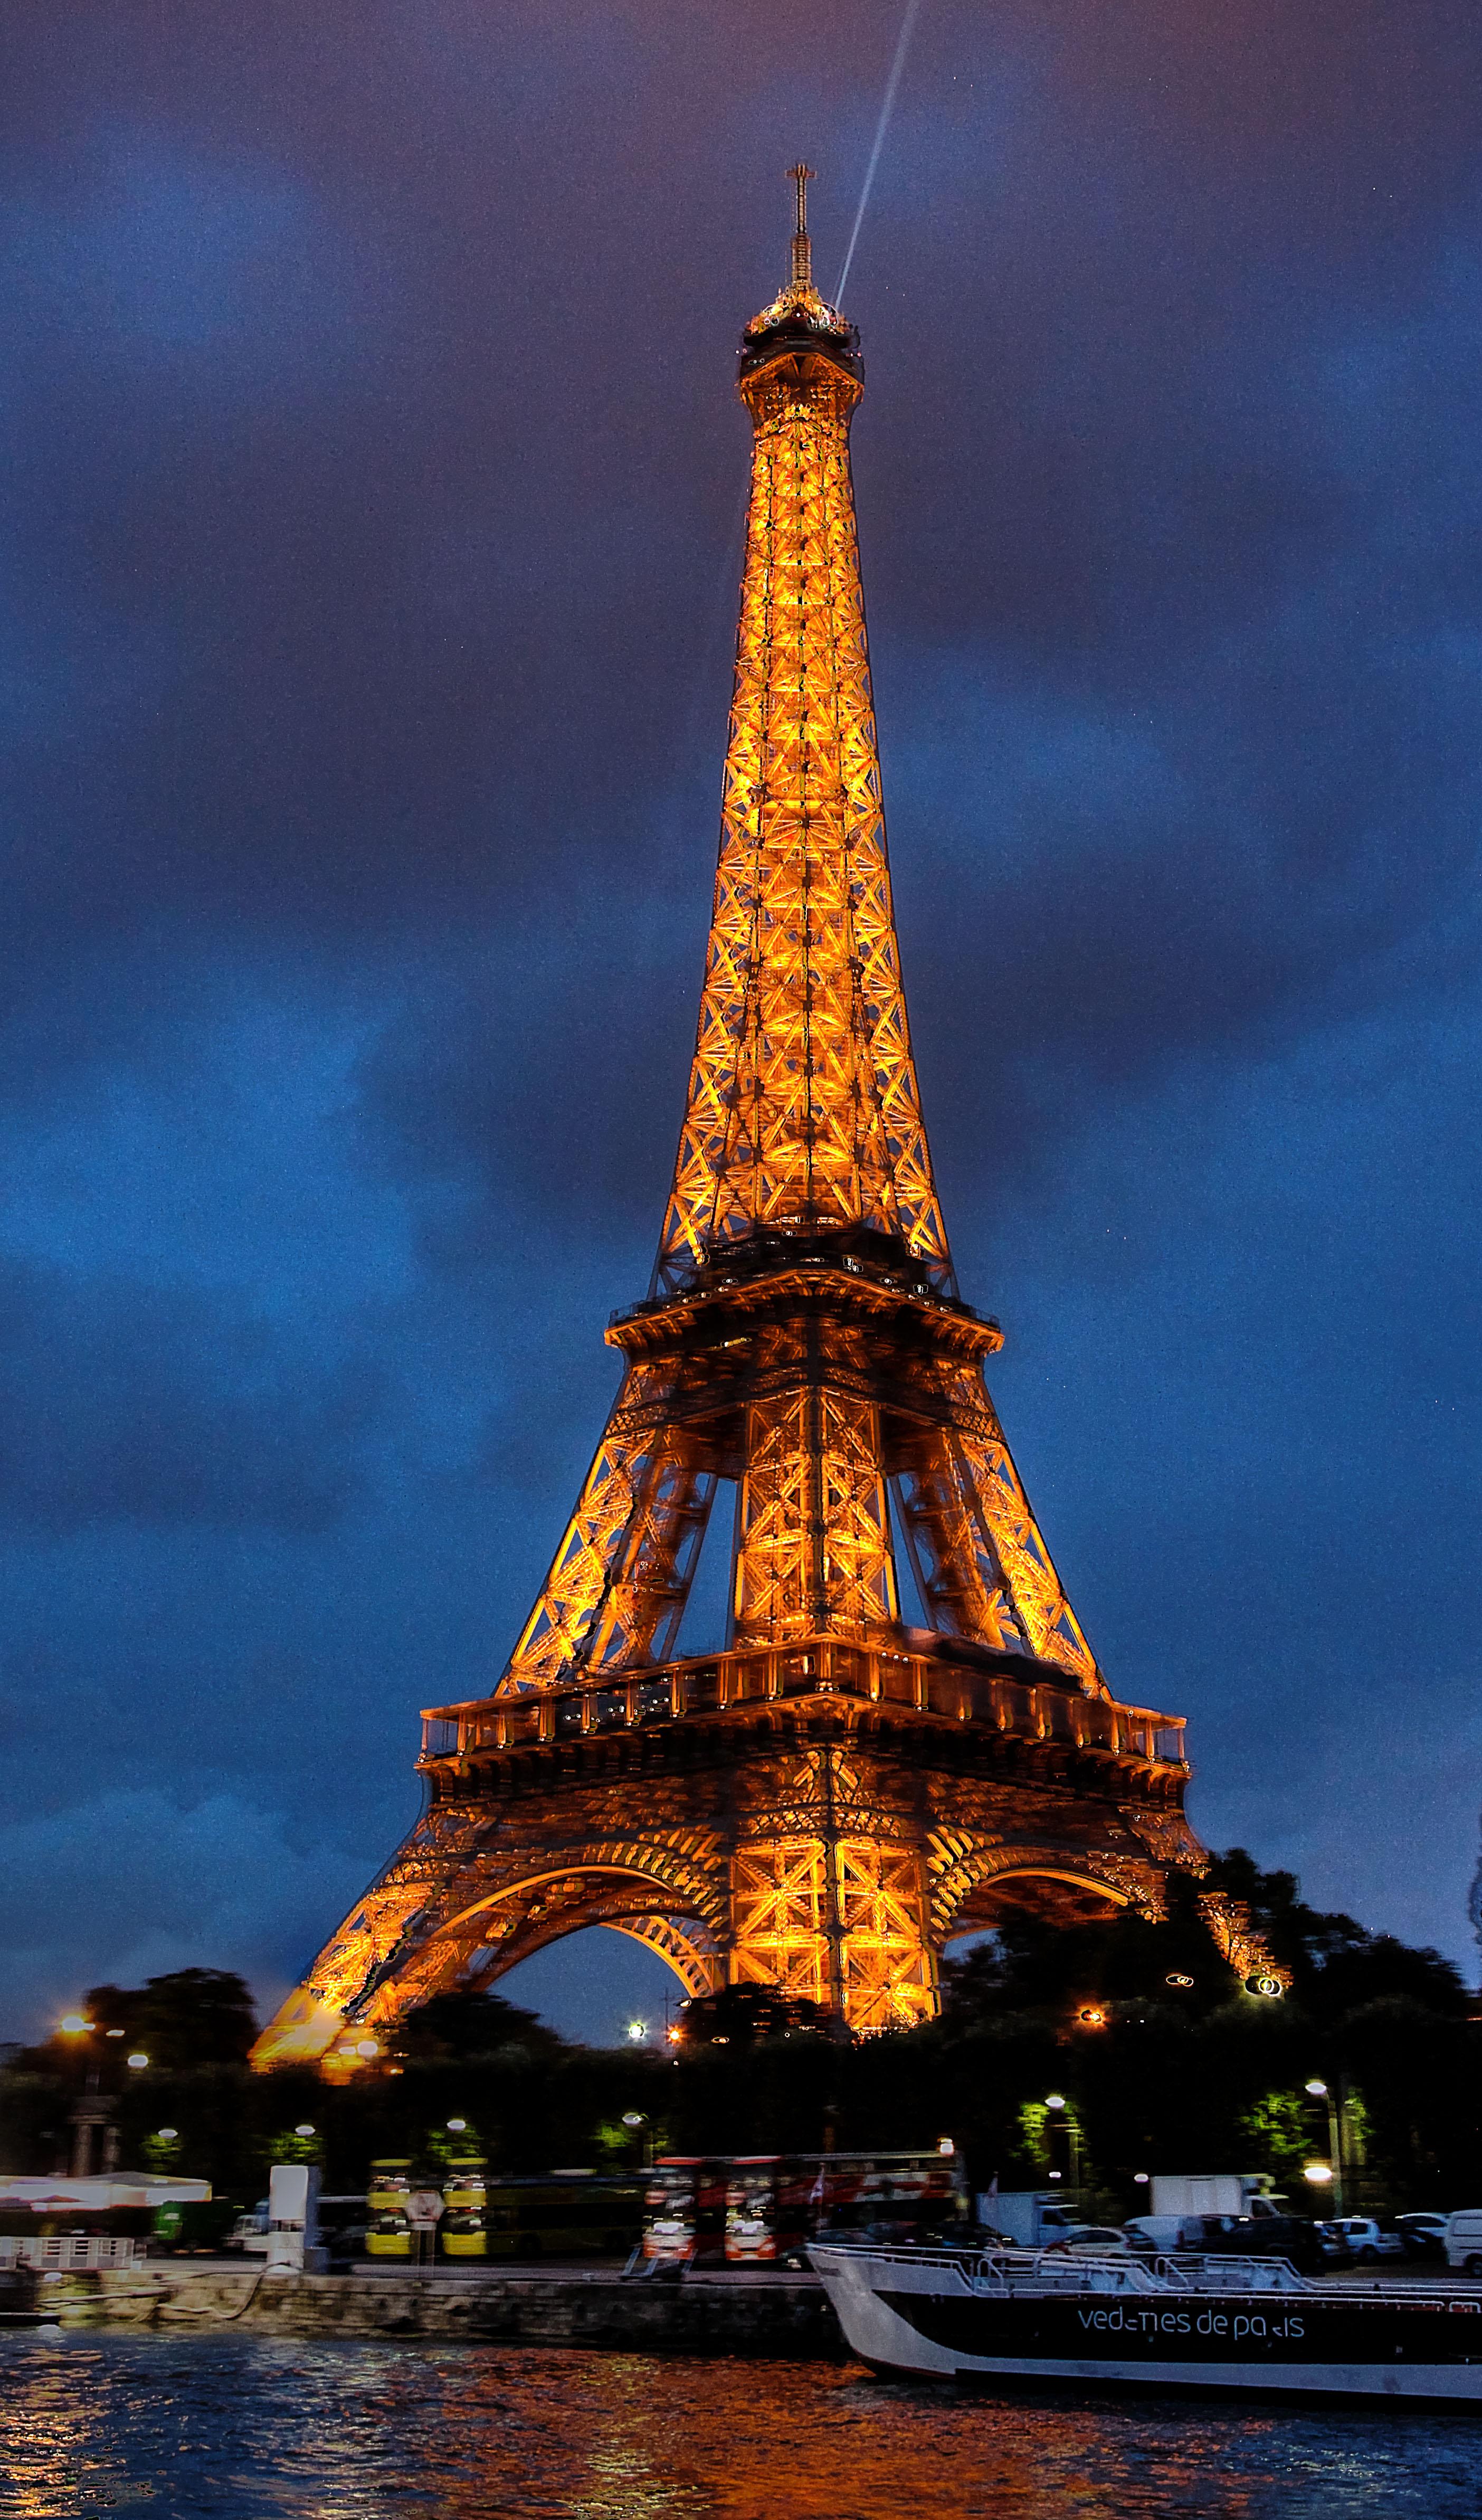 The Eiffel Tower Is Xxxx Feet Tall